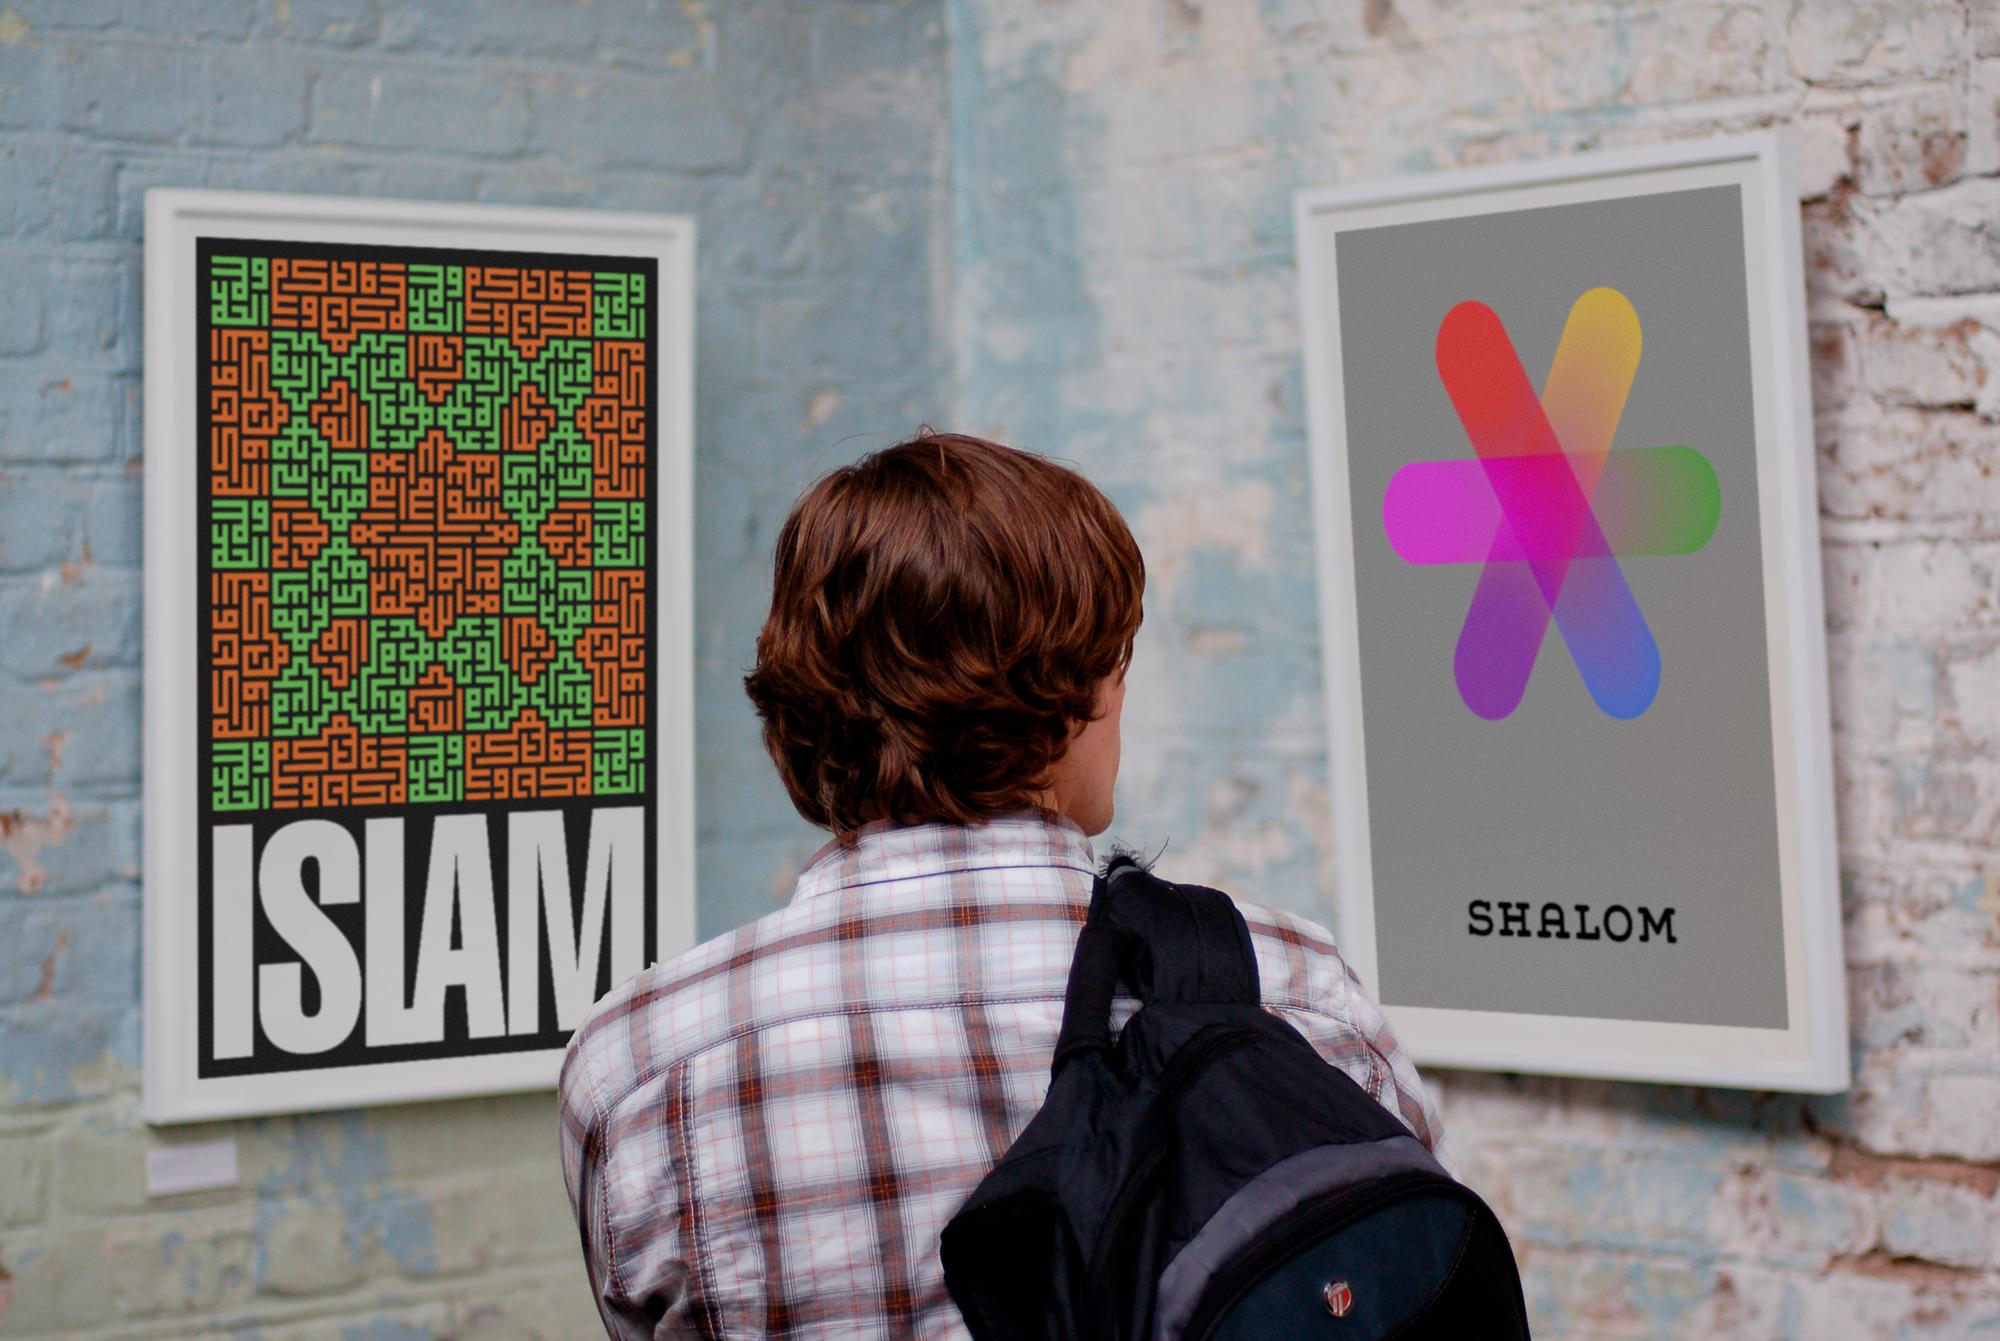 SHALOM-ISLAM-gabriel-benderski